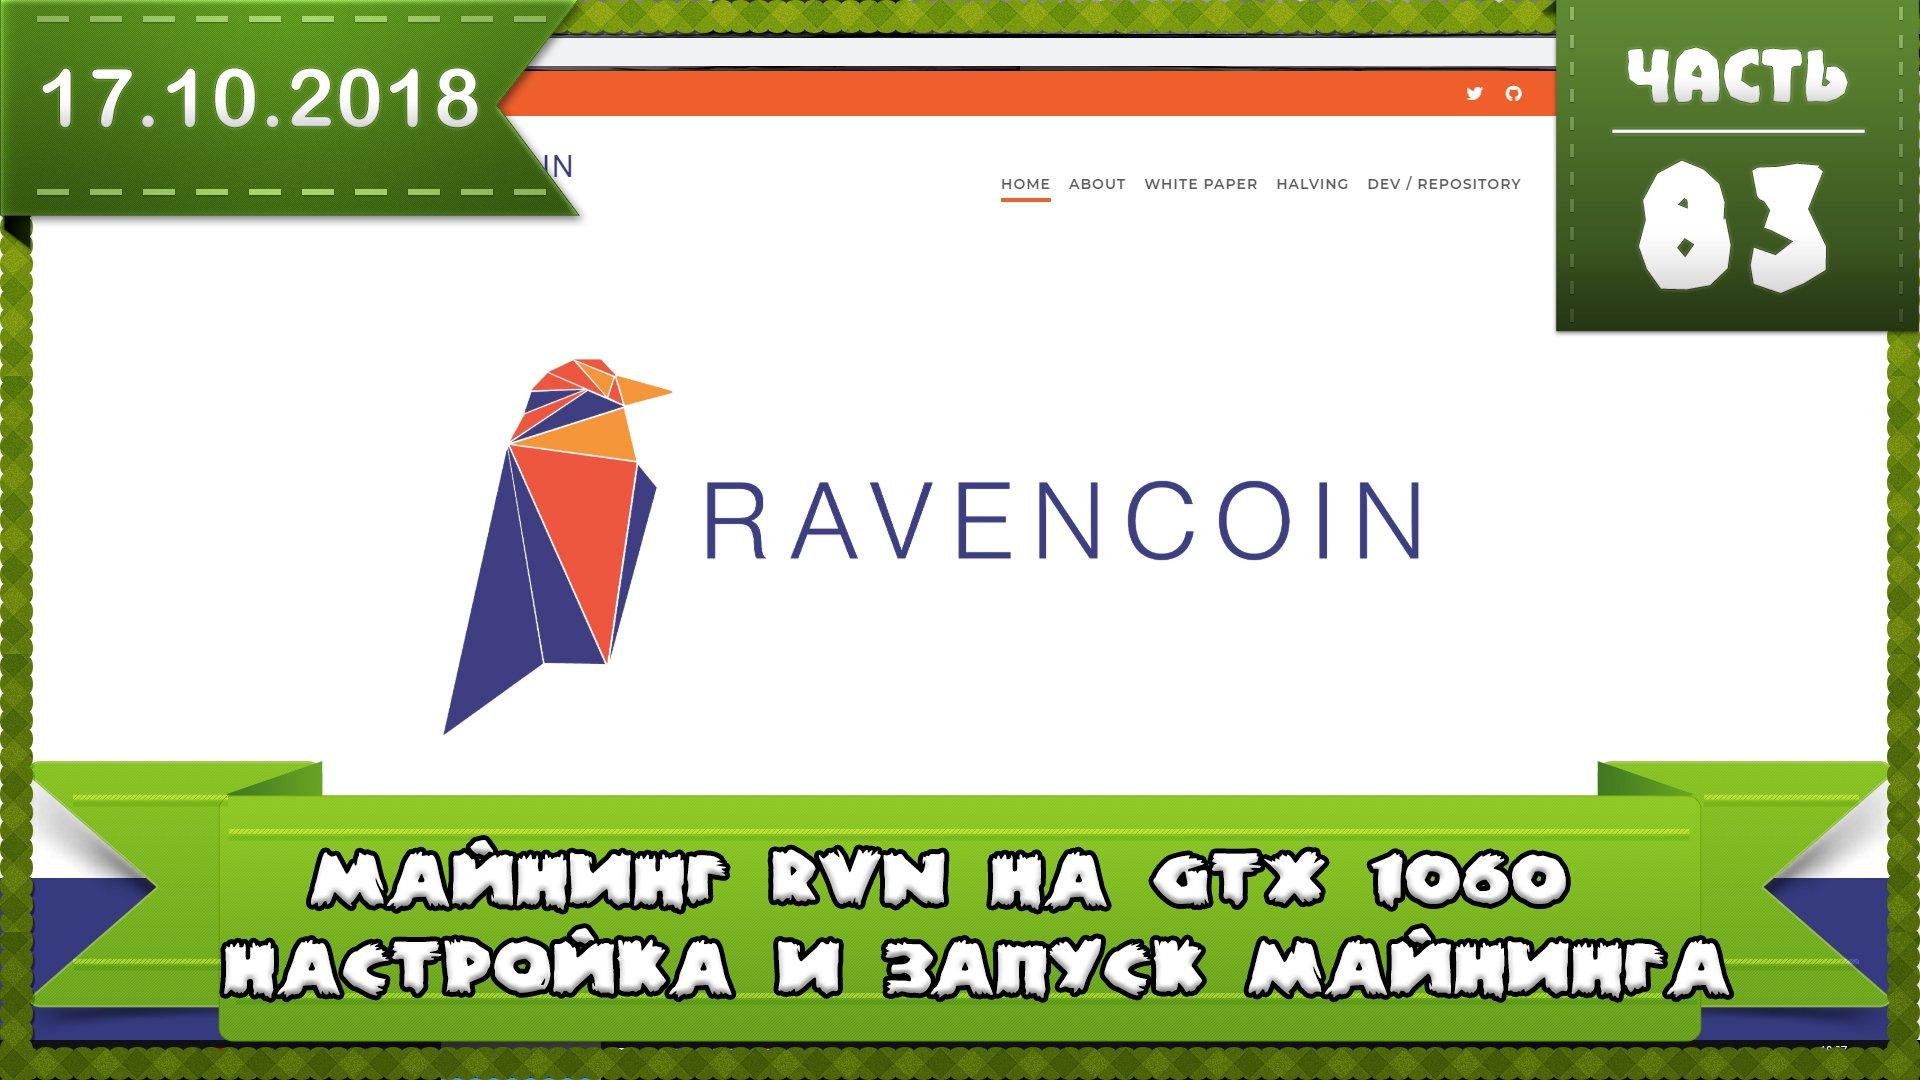 Как майнинть RAVENcoin (RVN) на одной видеокарте nvidia 1060, настройка программы, запуск майнинга